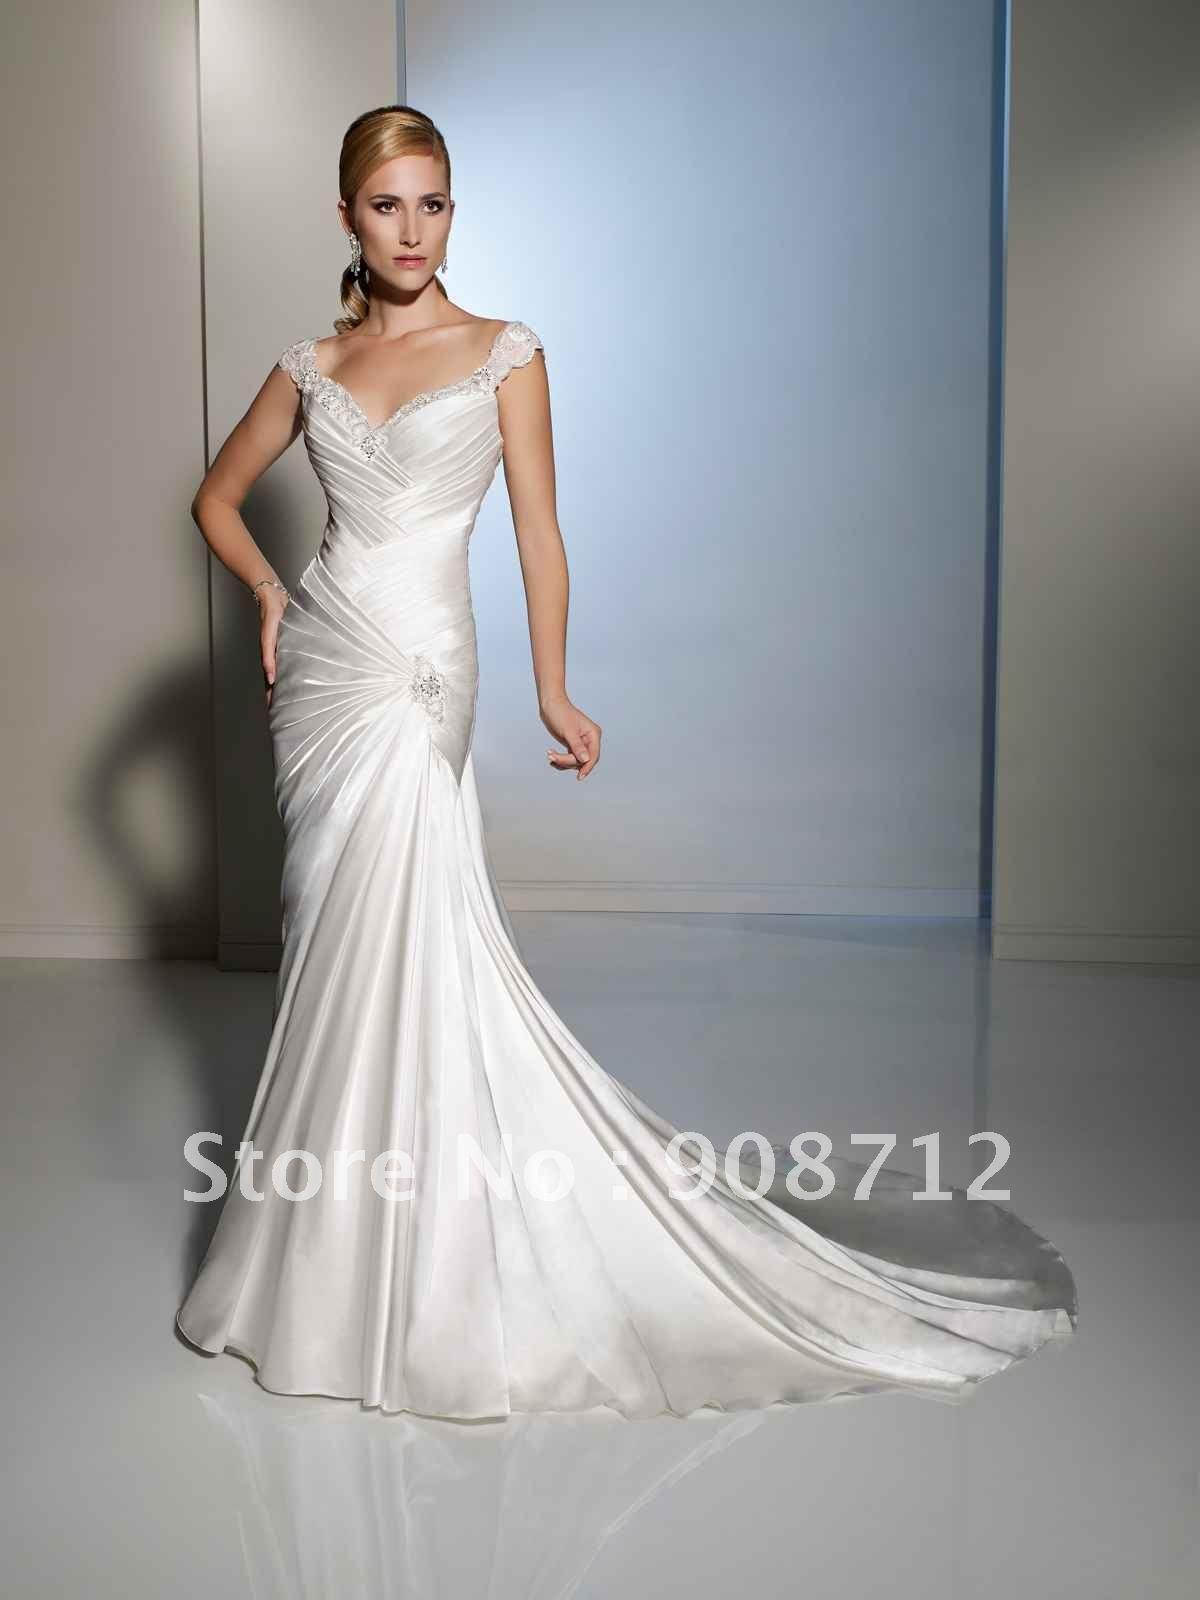 Designer Wedding Dresses With Sleeves 81